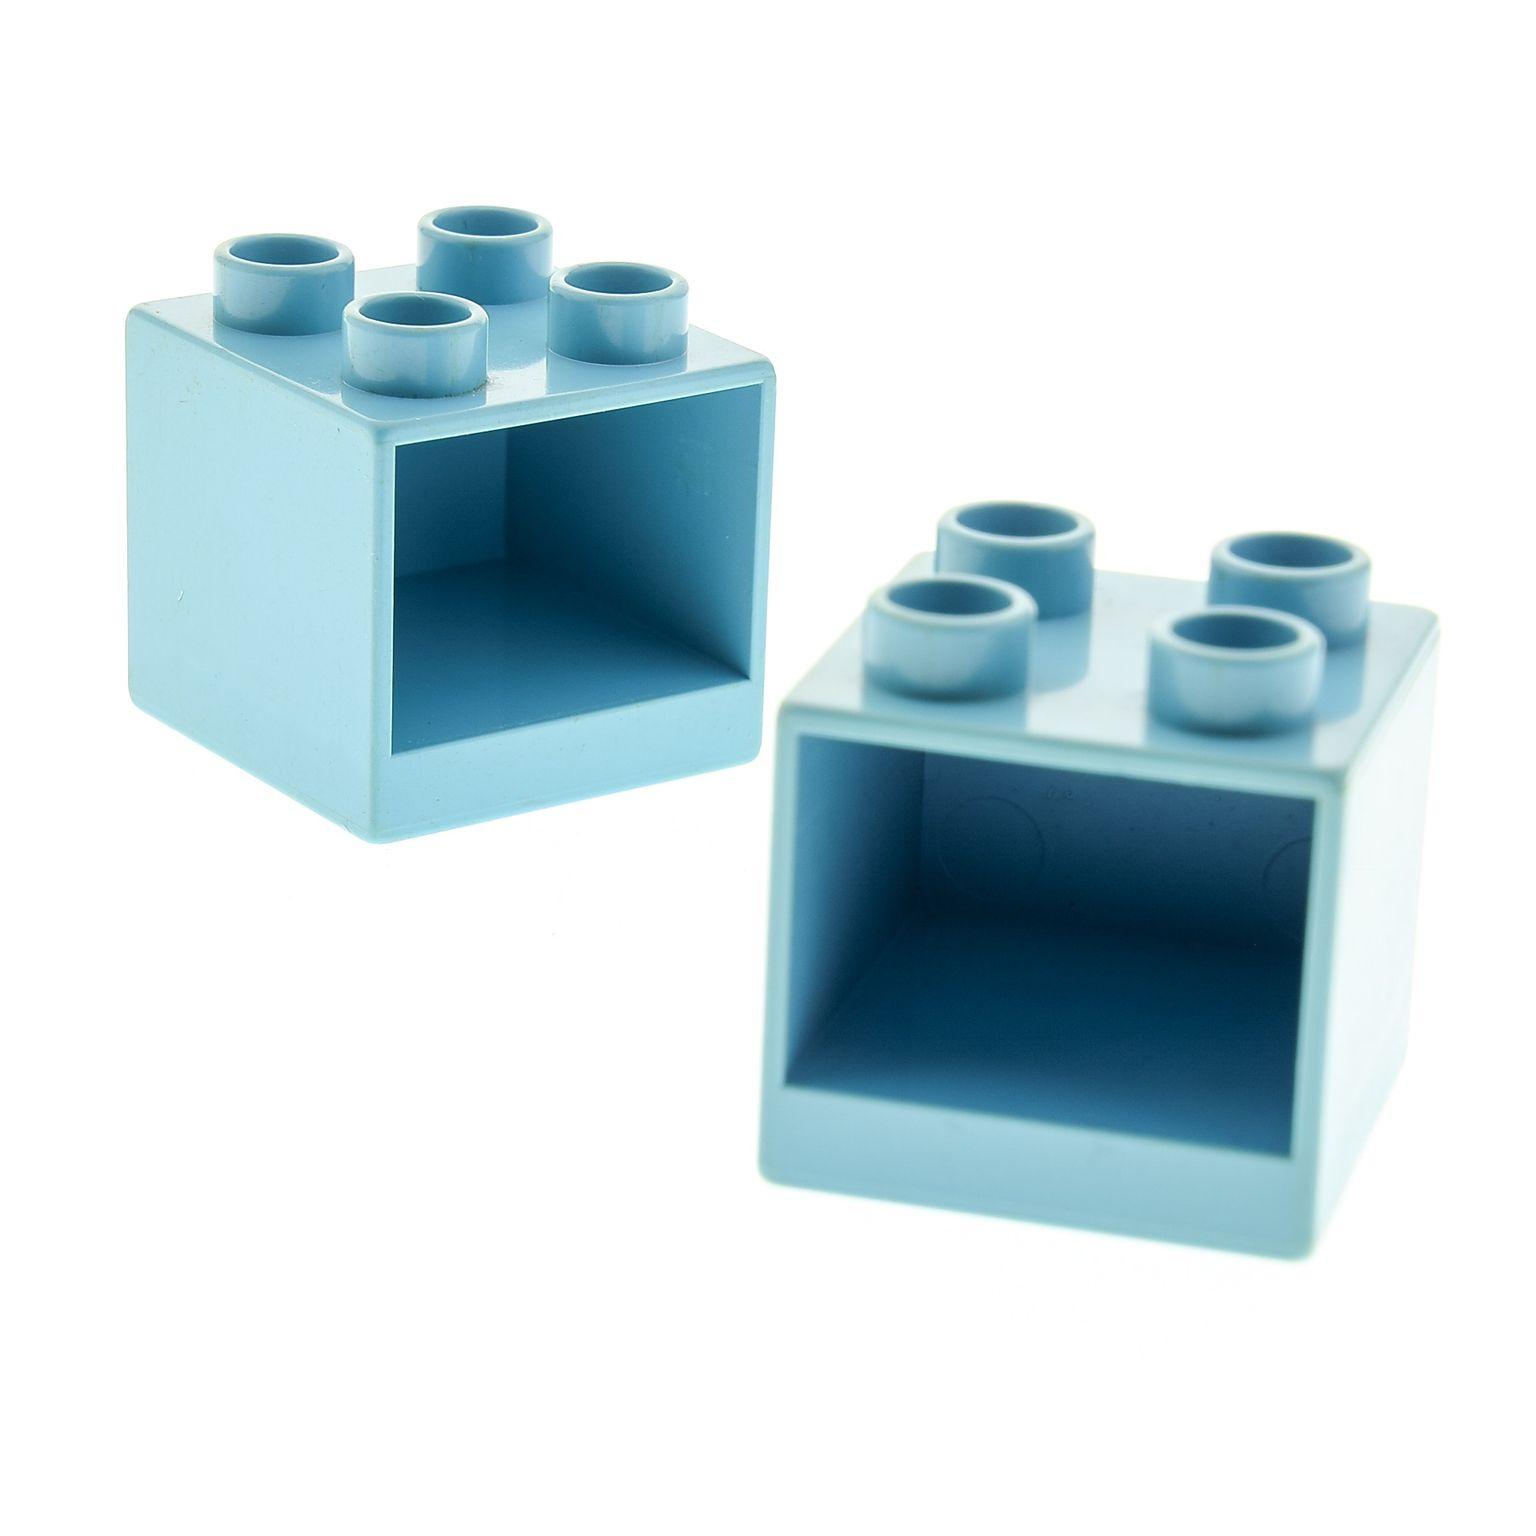 2 X Lego Brick Light Blue Duplo Furniture Cabinet 2 X 2 X 1 5 With